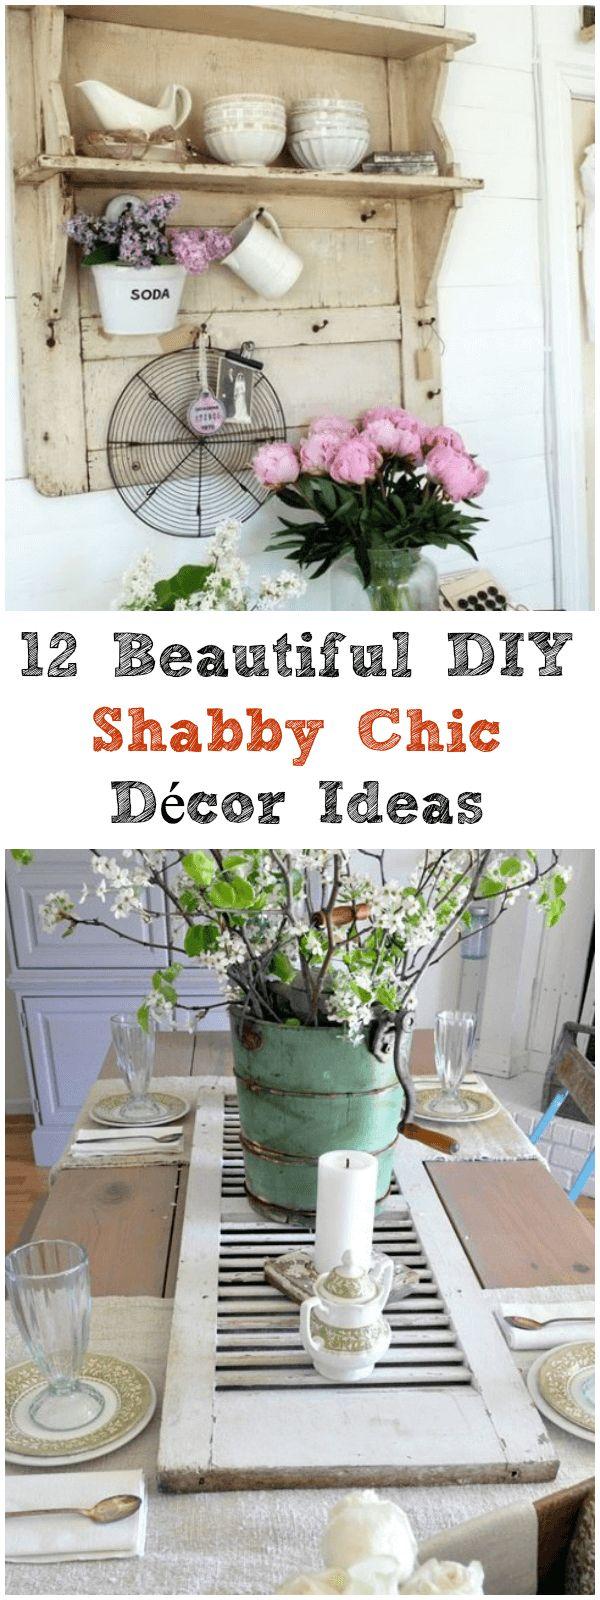 12 Beautiful DIY Shabby Chic Dcor Ideas